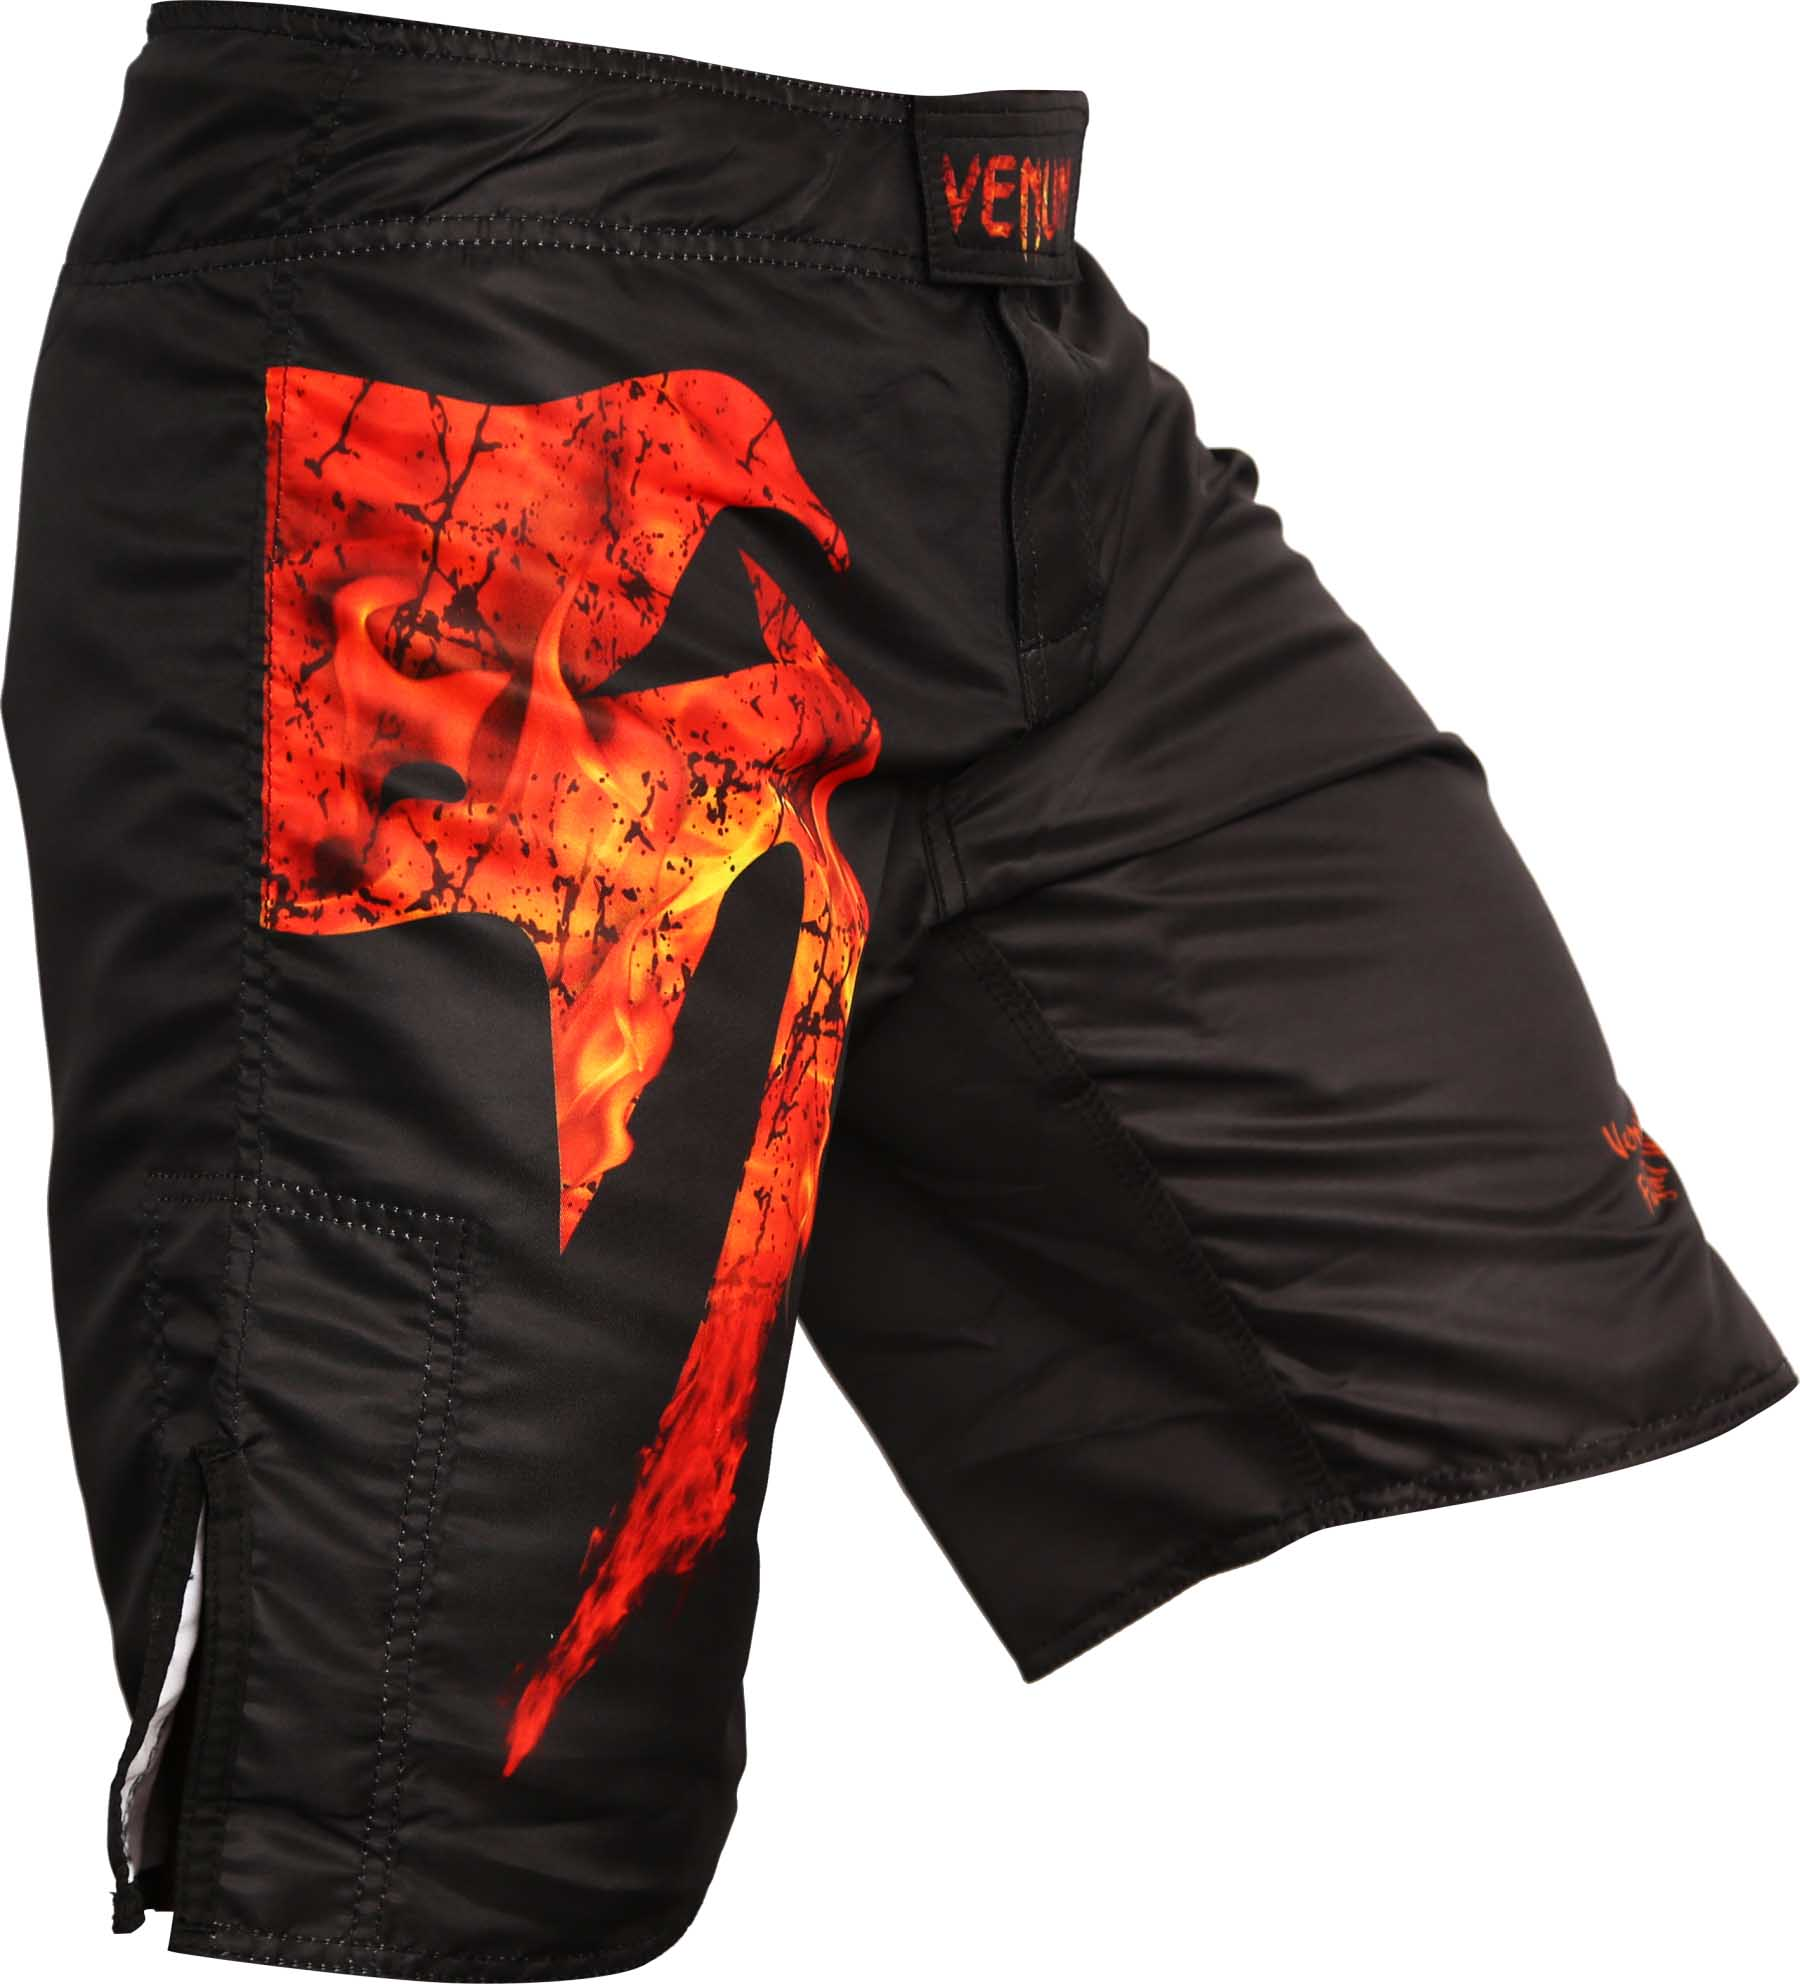 Bermuda MMA Giant Fire - Preto/Vermelho - Venum Fight